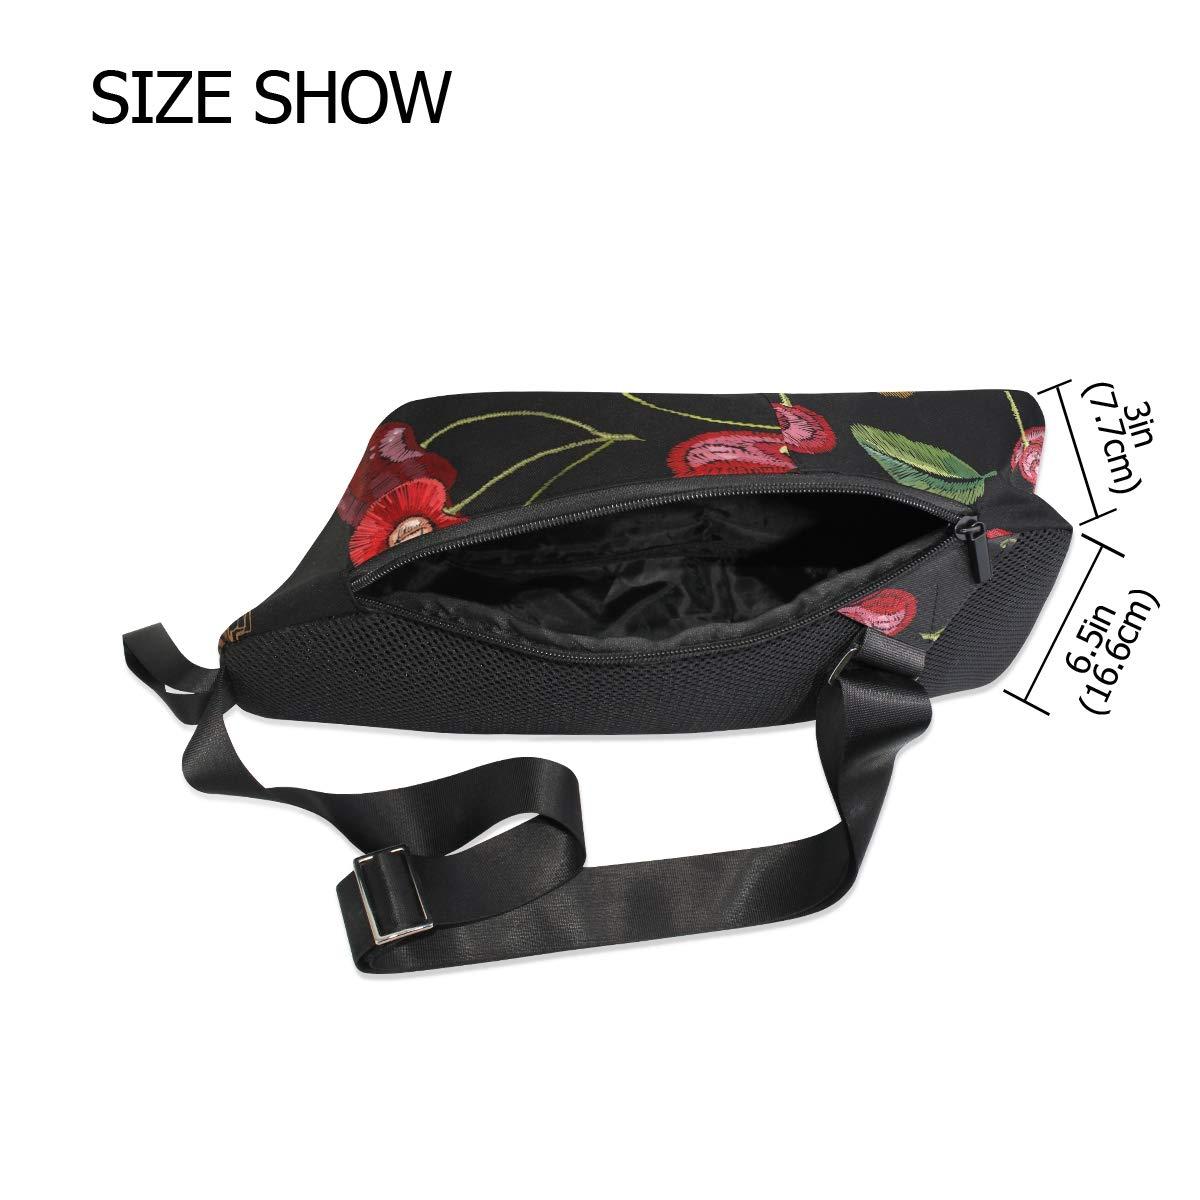 Unisex Messenger Bag Cherry Insect Patterns Shoulder Chest Cross Body Backpack Bag